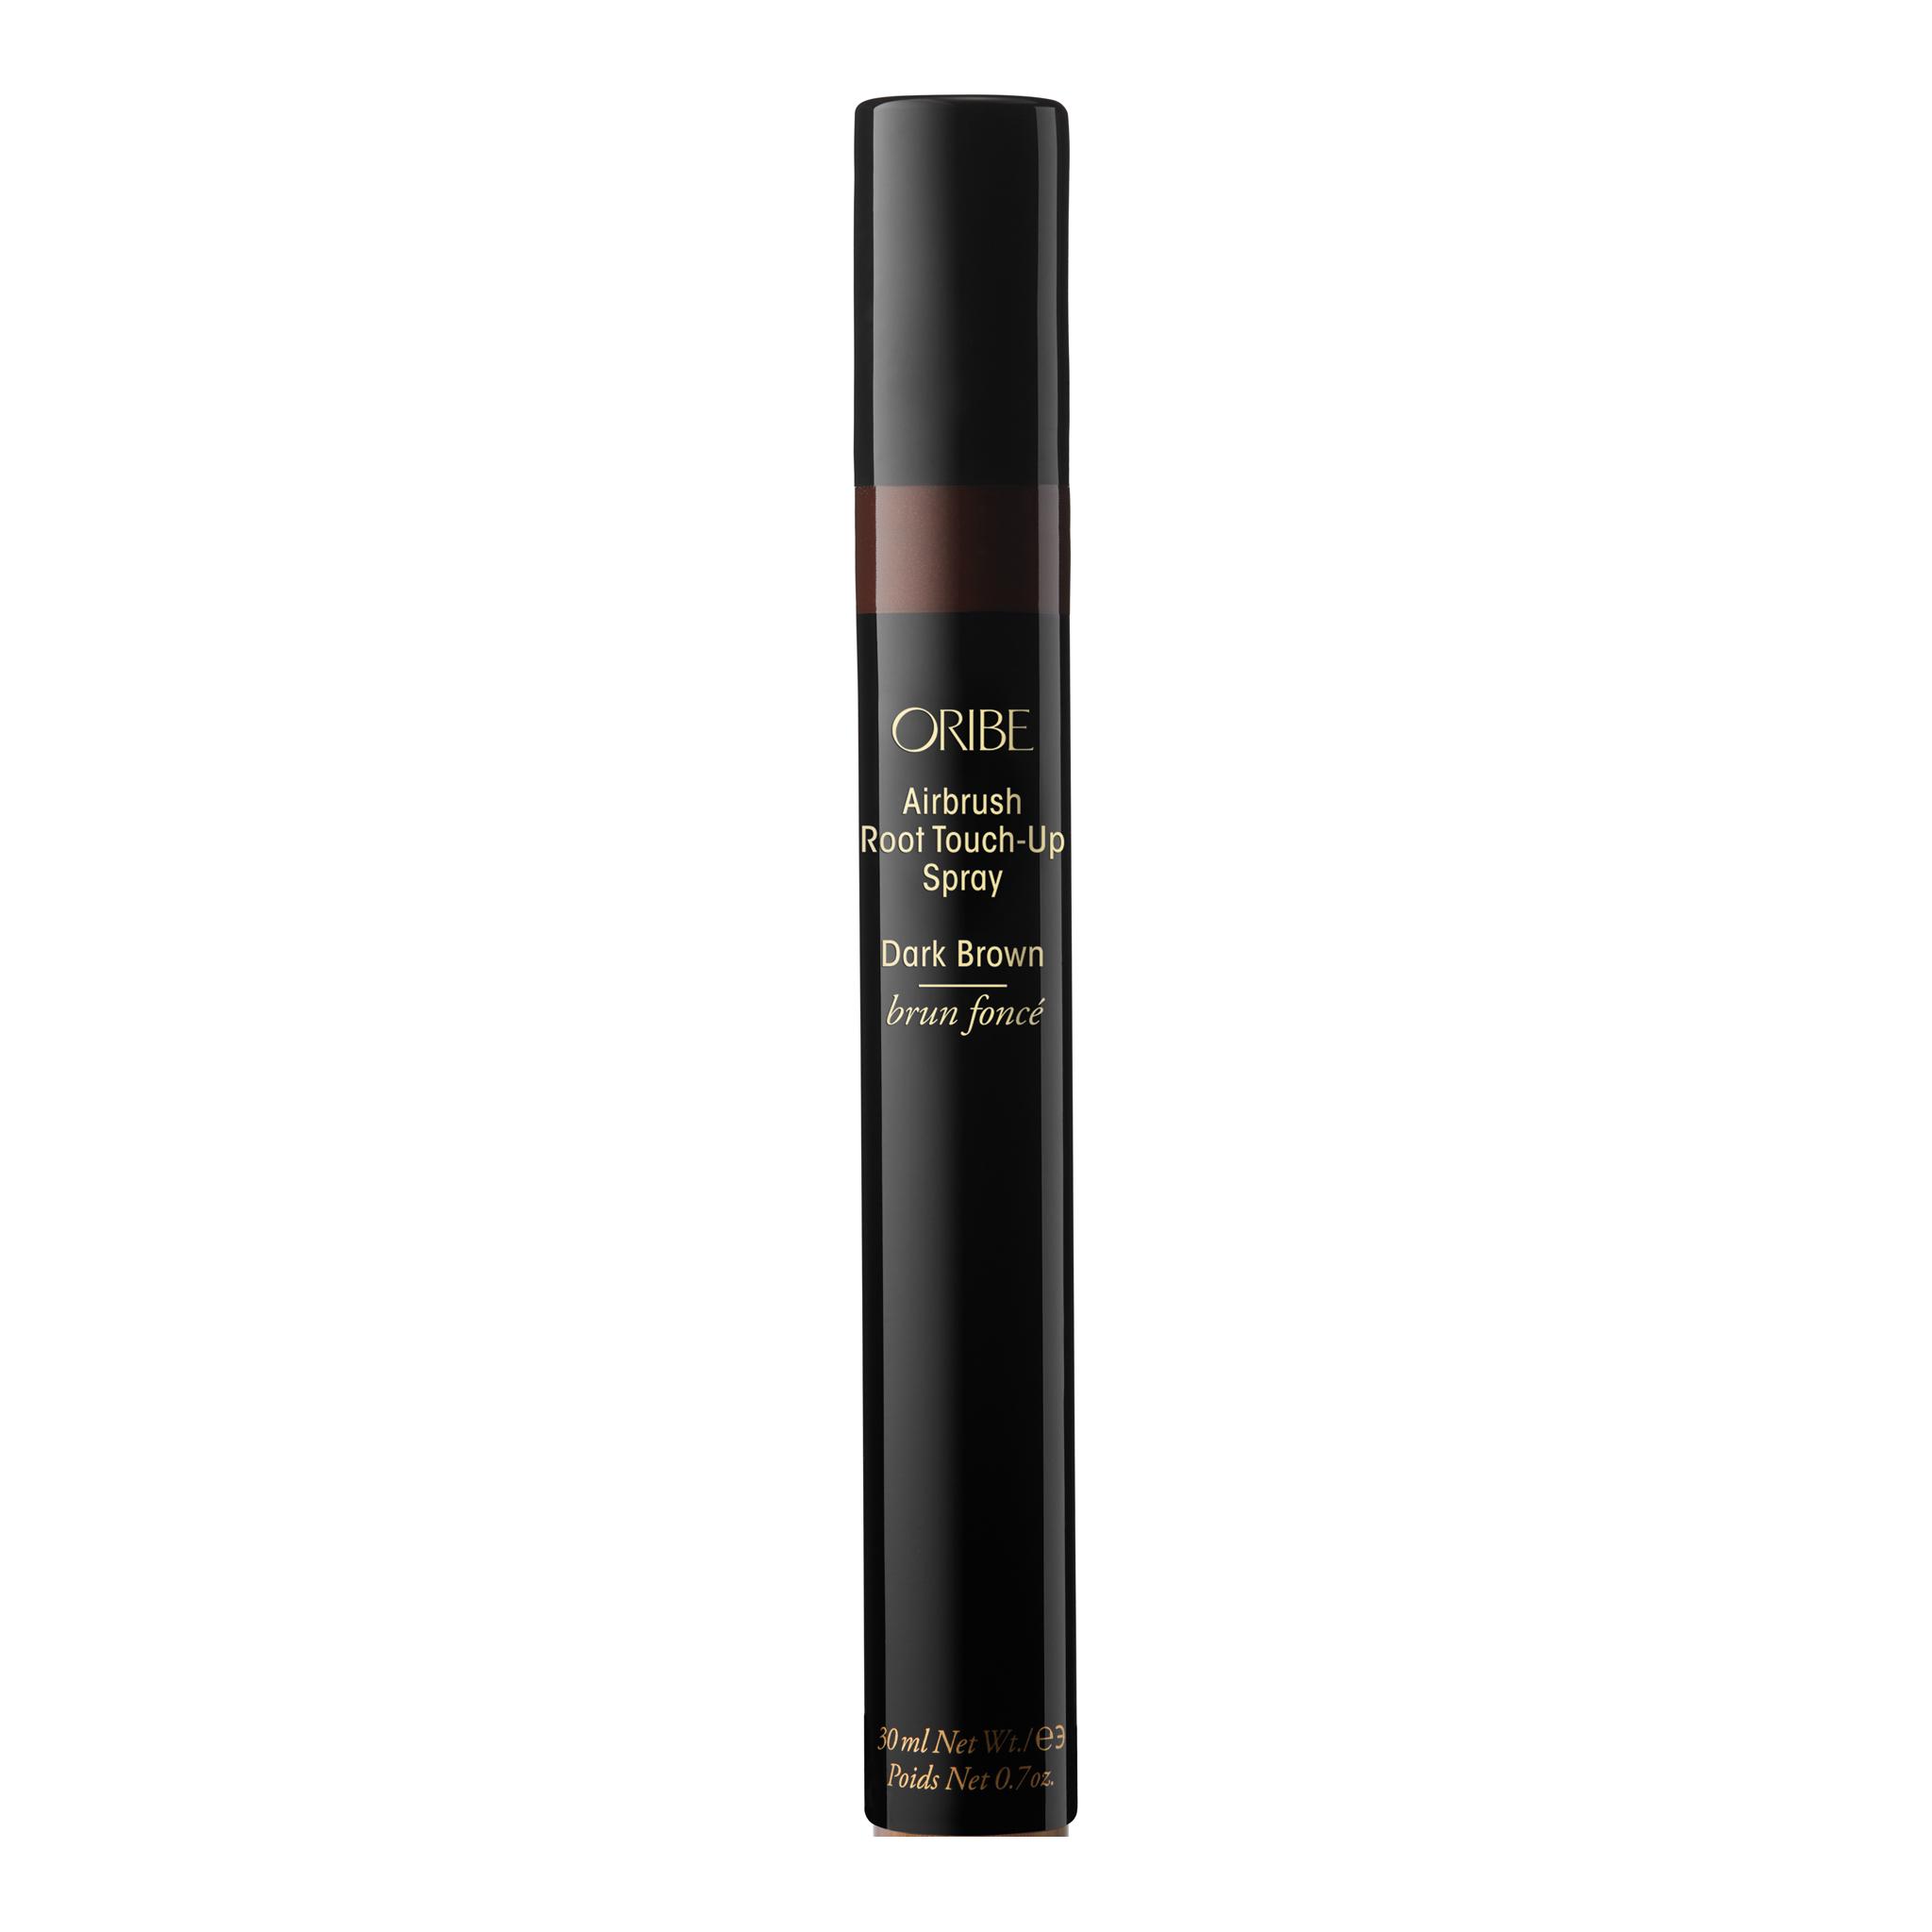 Airbrush Root Touch-Up Spray - Dark Brown 30mL